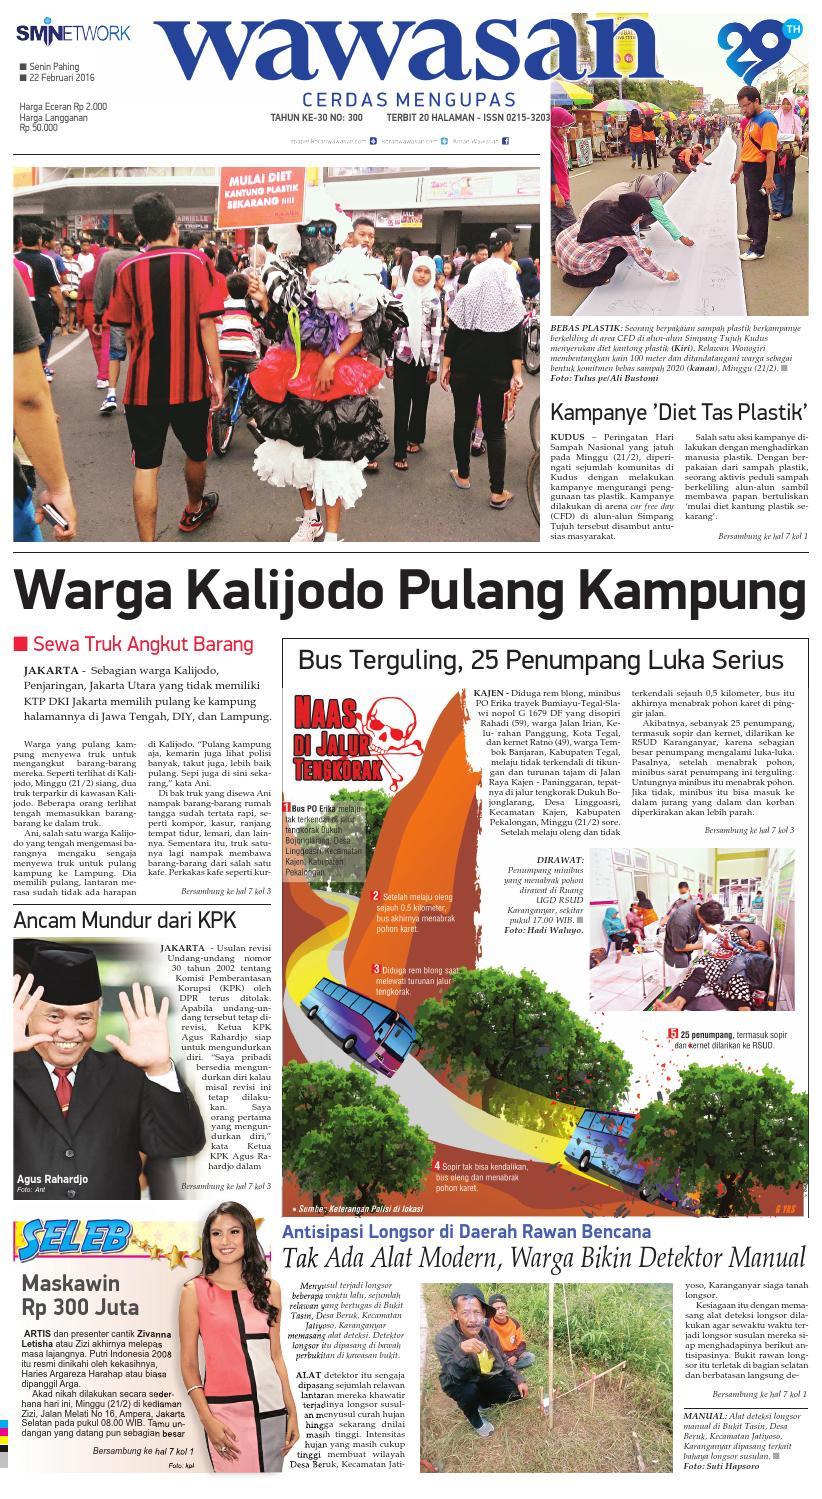 WAWASAN 22 Februari 2016 by KORAN PAGI WAWASAN - issuu 47f7f5494d